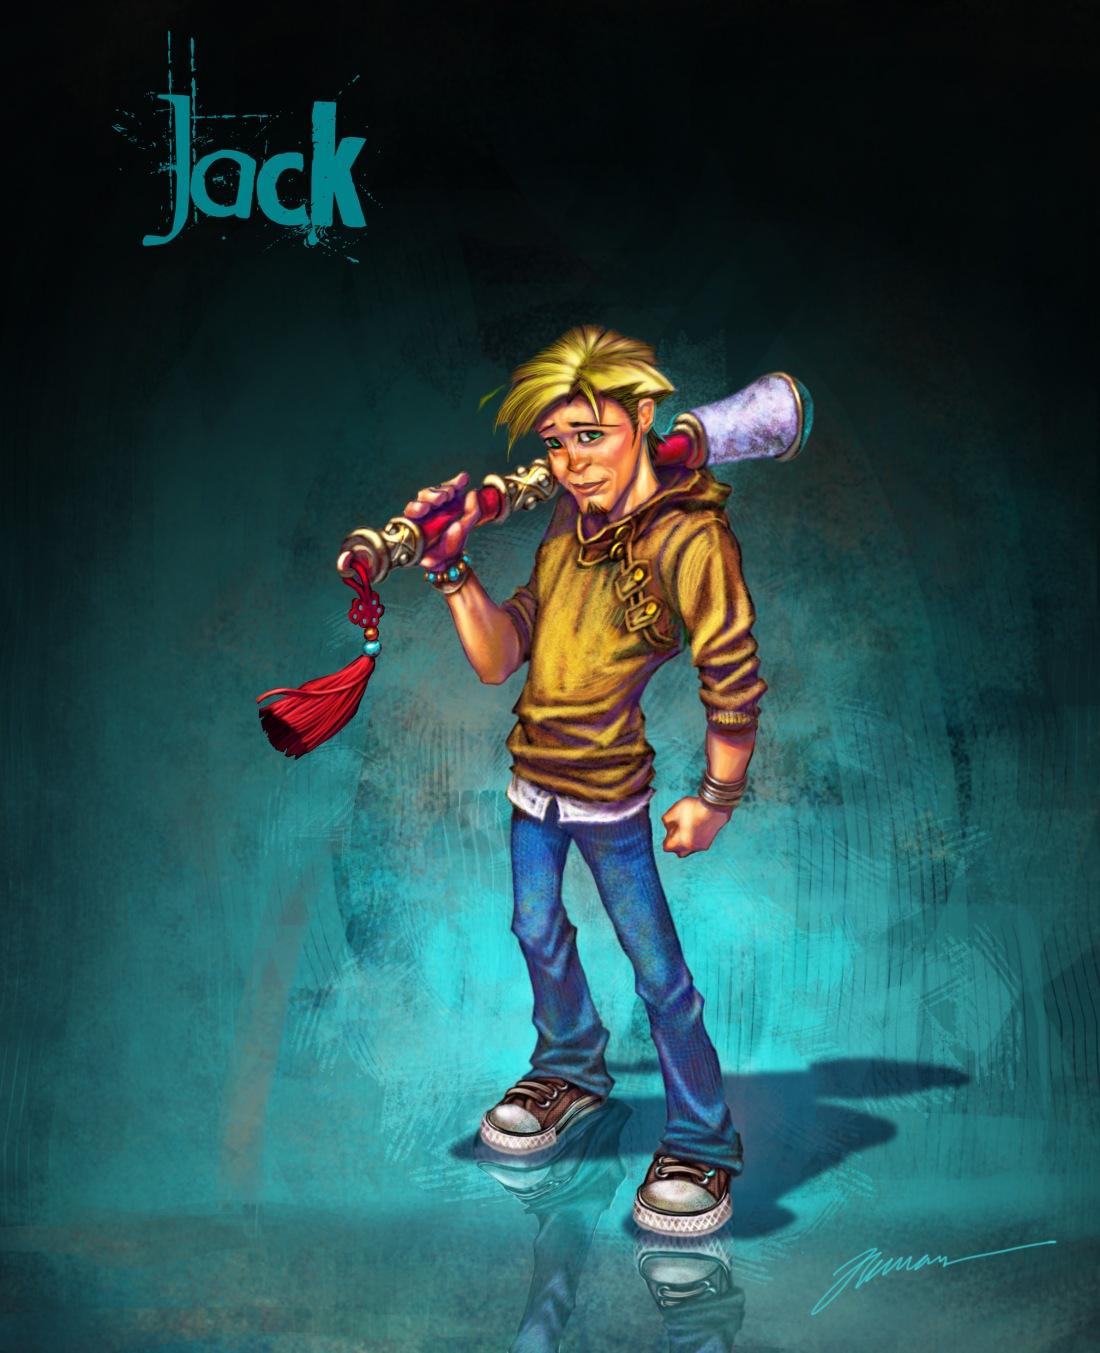 Gary_Freeman_Concept_Art_Jack